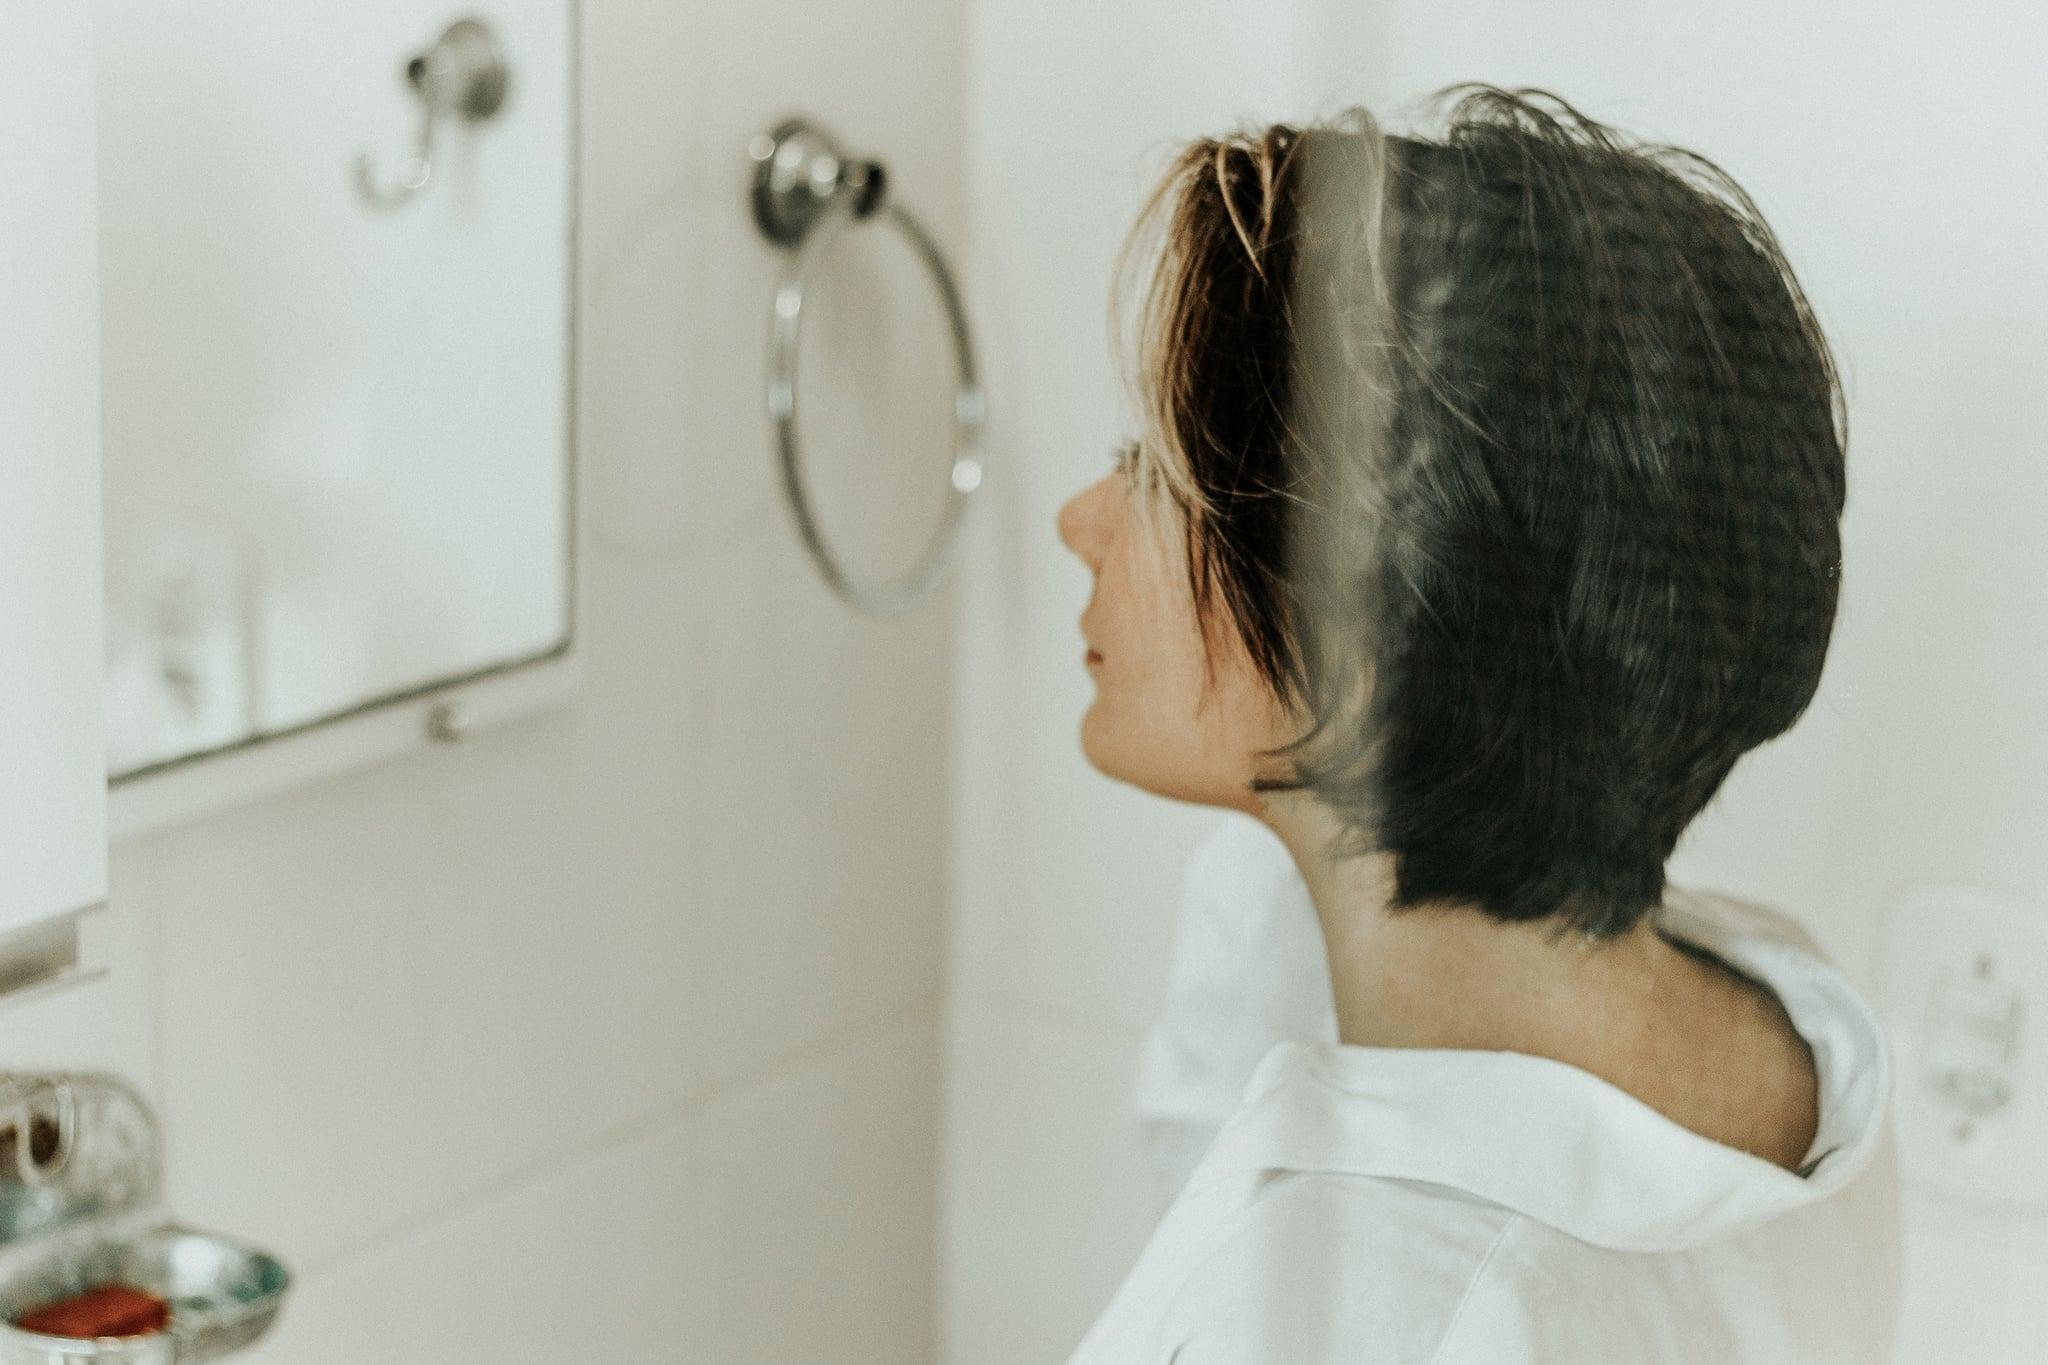 tmp_hlqMgs_ebffca1945756fa7_bath-bathroom-blur-2225905.jpg